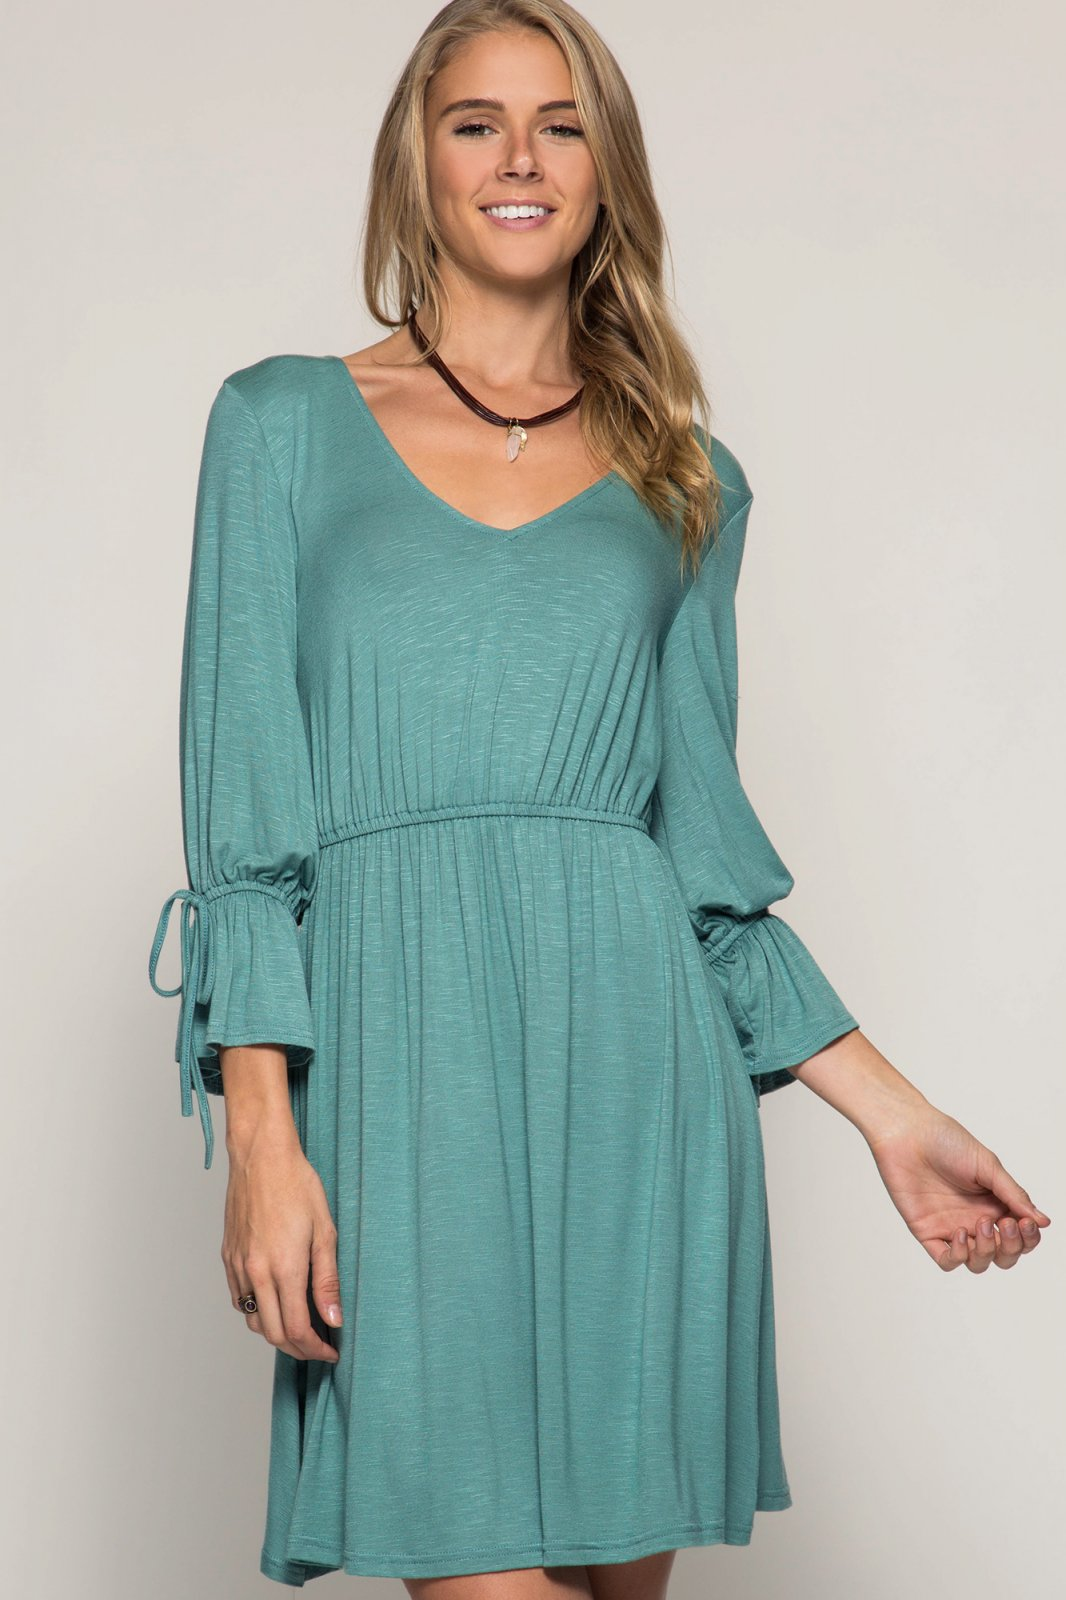 DRESS or TUNIC - 3/4 Sleeve SLATE GREEN * RAYON